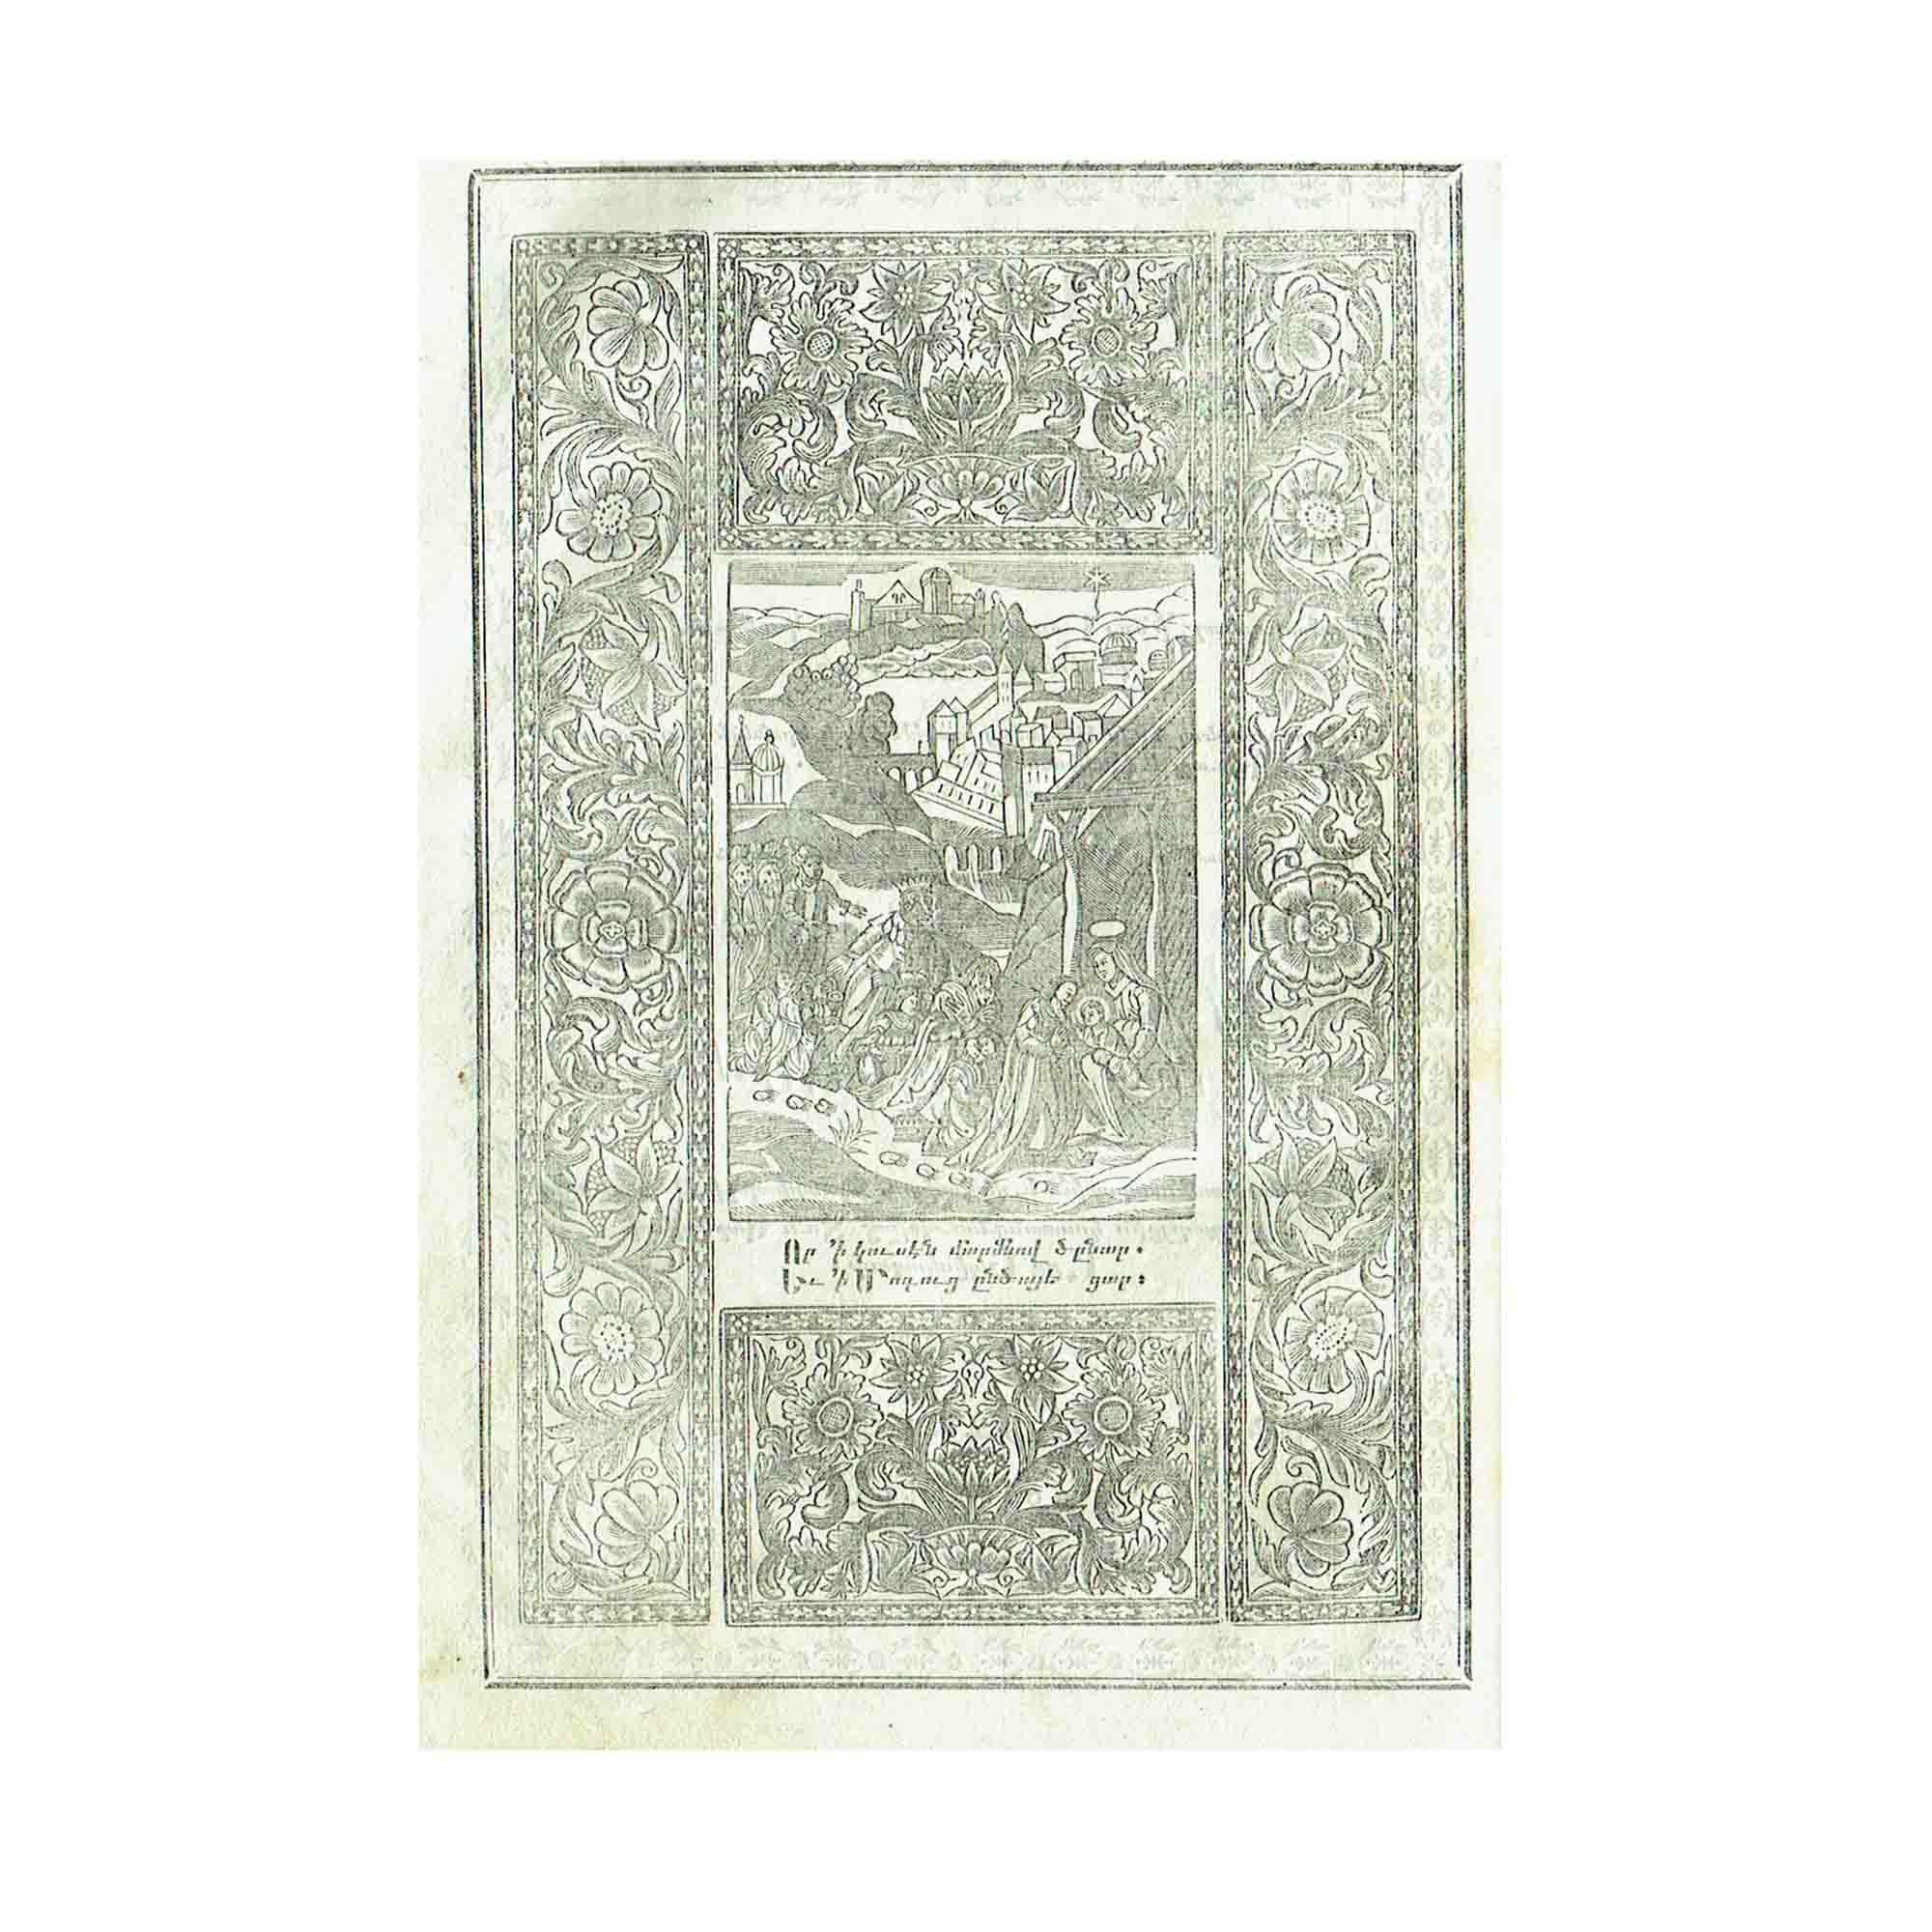 5305-Armenian-Prayers-1827-1828-Frontispiece-N.jpg